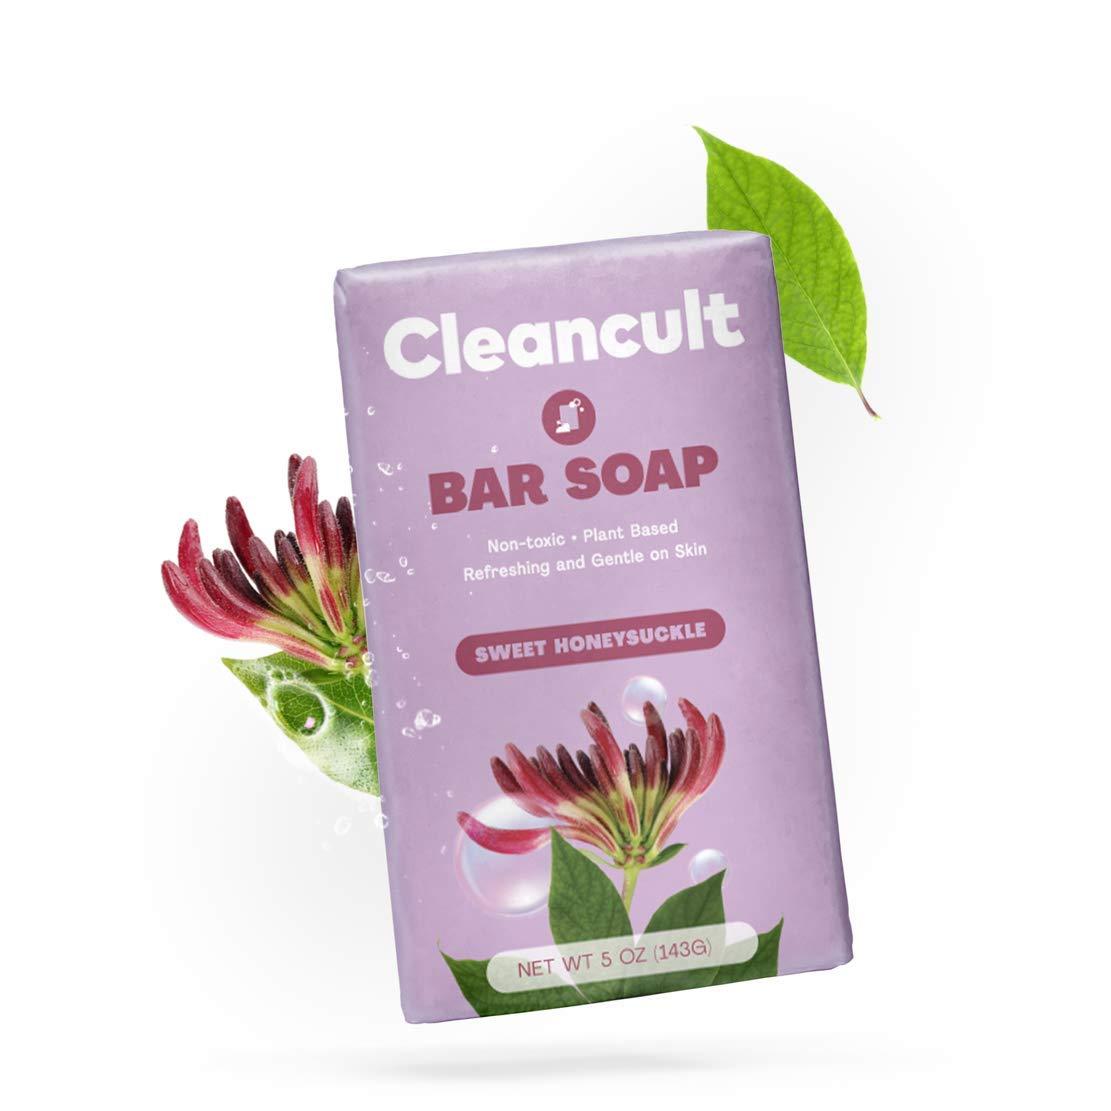 Cleancult Natural Bar Soap for Hands Body & Face, Sweet Honeysuckle Scent, 5 oz Bar, Cruelty Free & Eco Friendly, Men & Women, Sensitive Skin Moisturizing Formula, Plastic Free Packaging